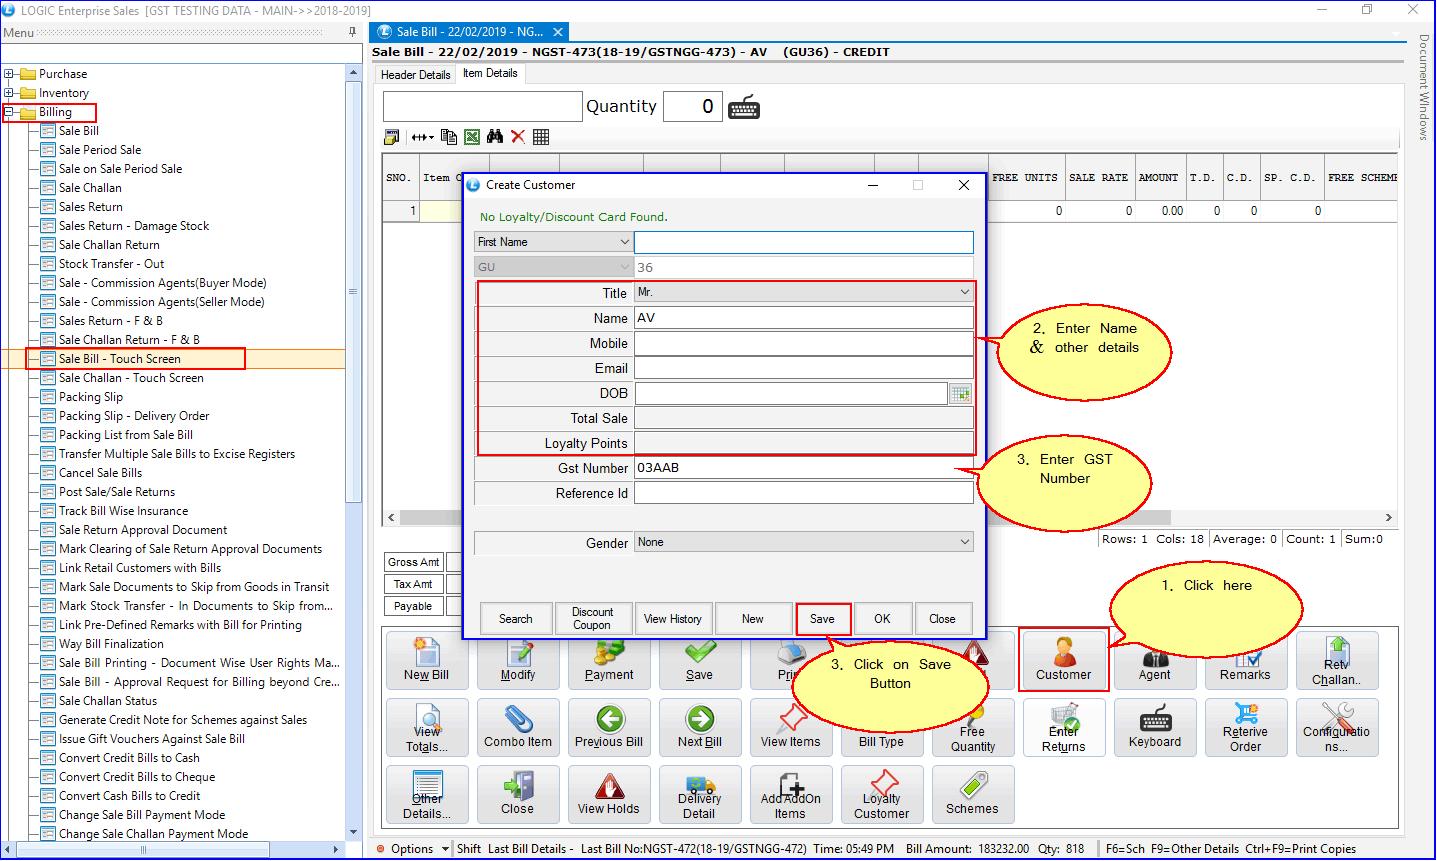 Sale Bill-Touch Screen